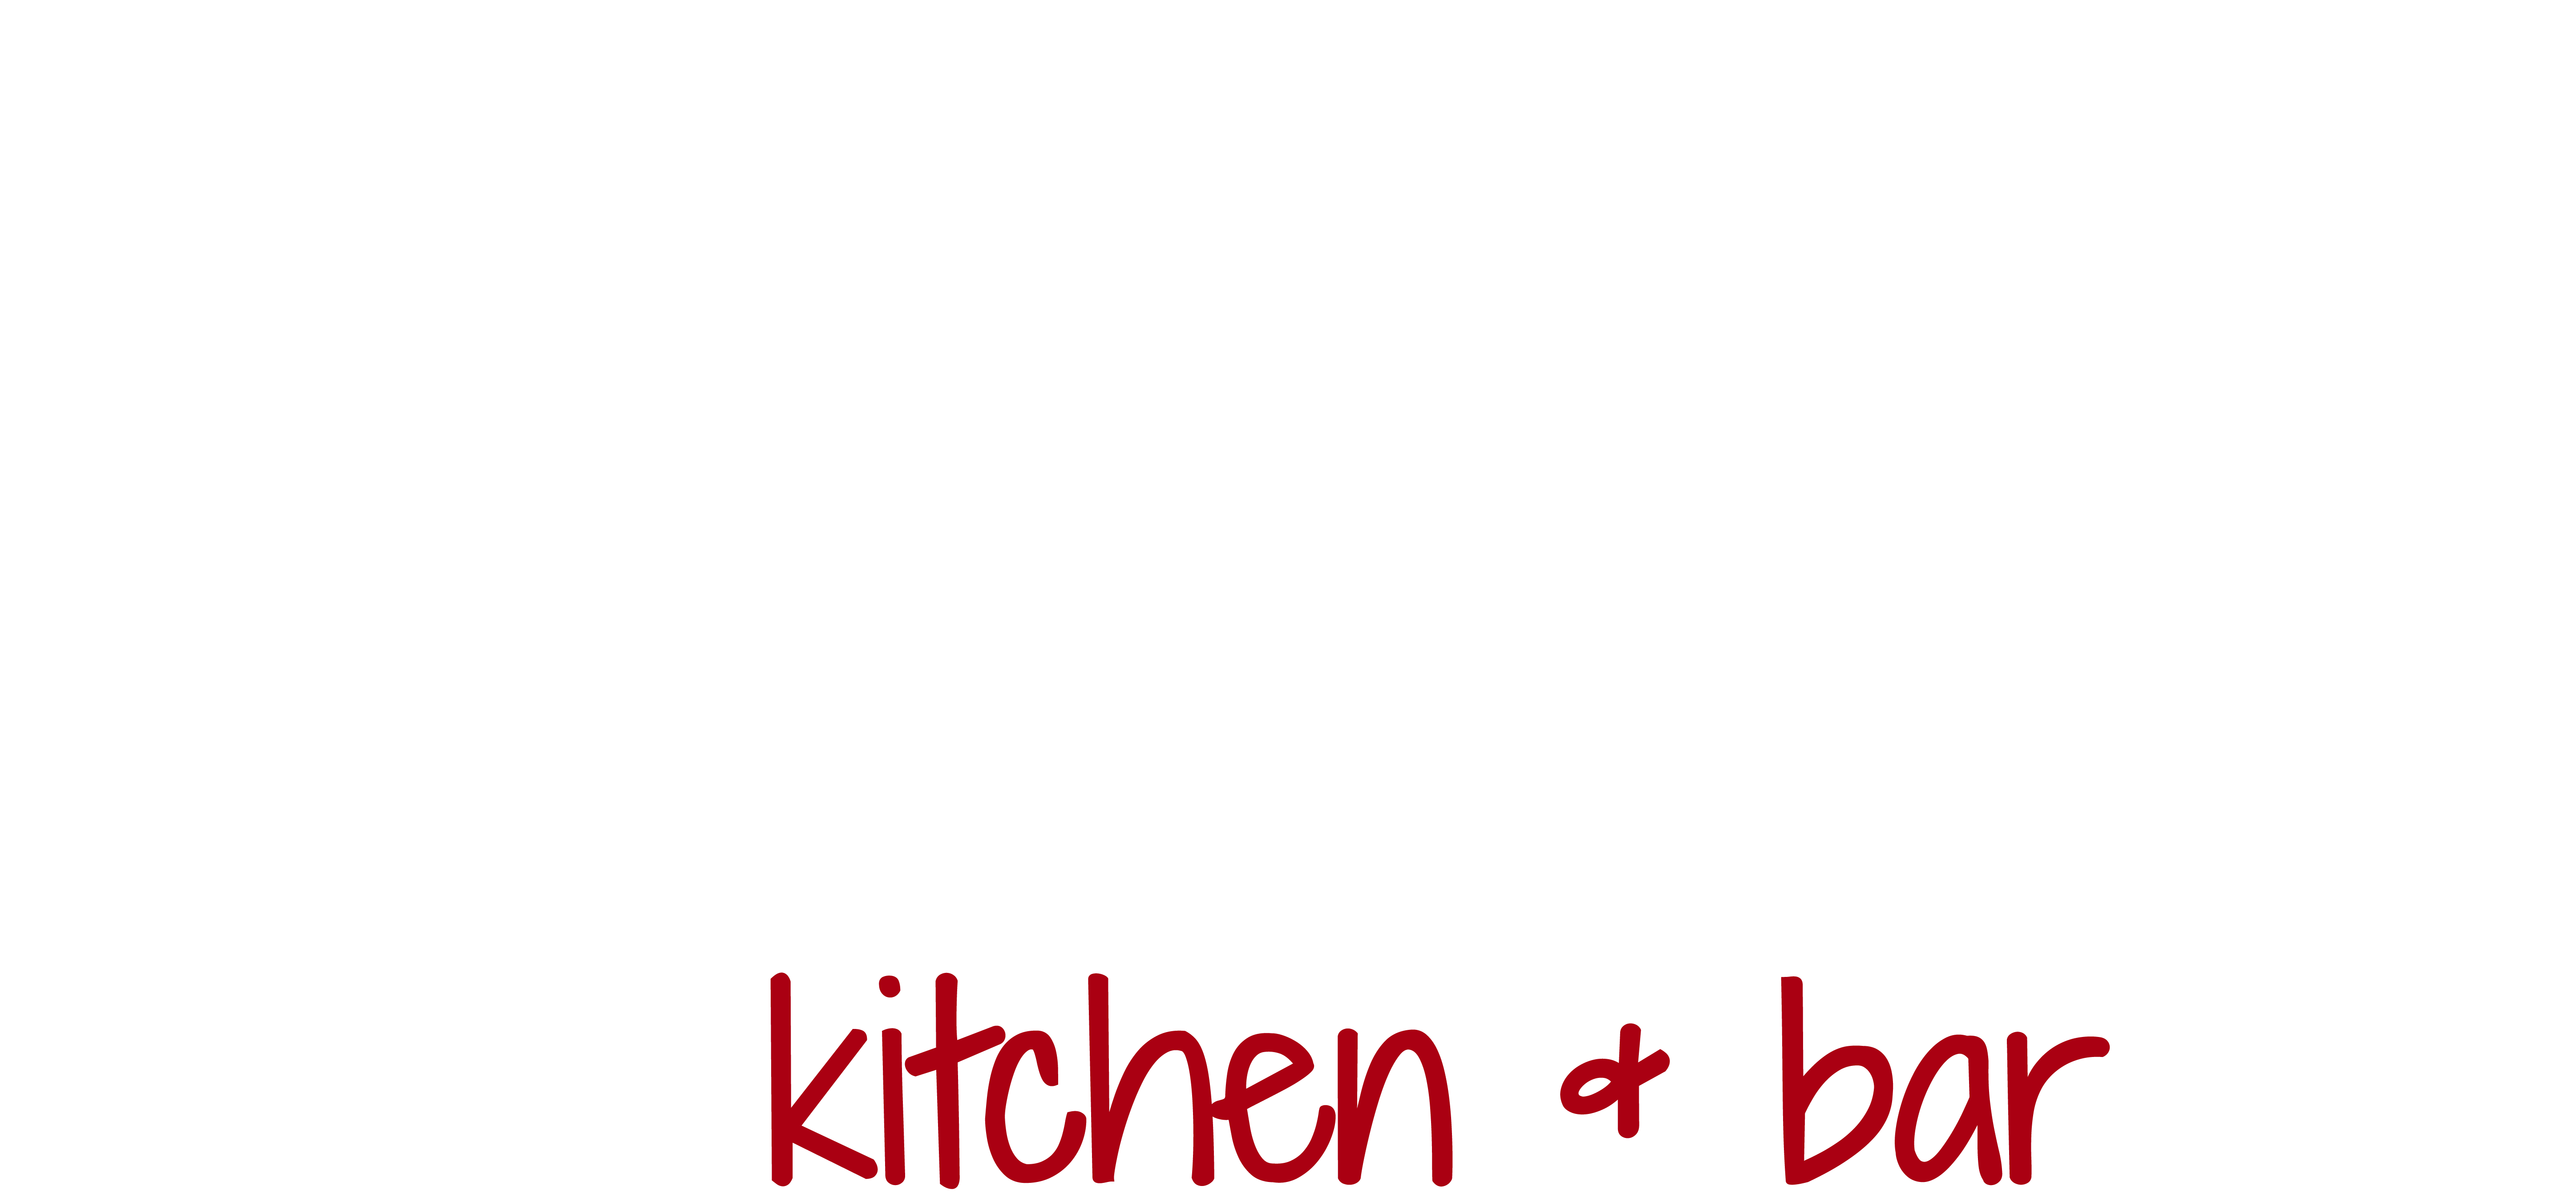 Crust Kitchen & Bar Home